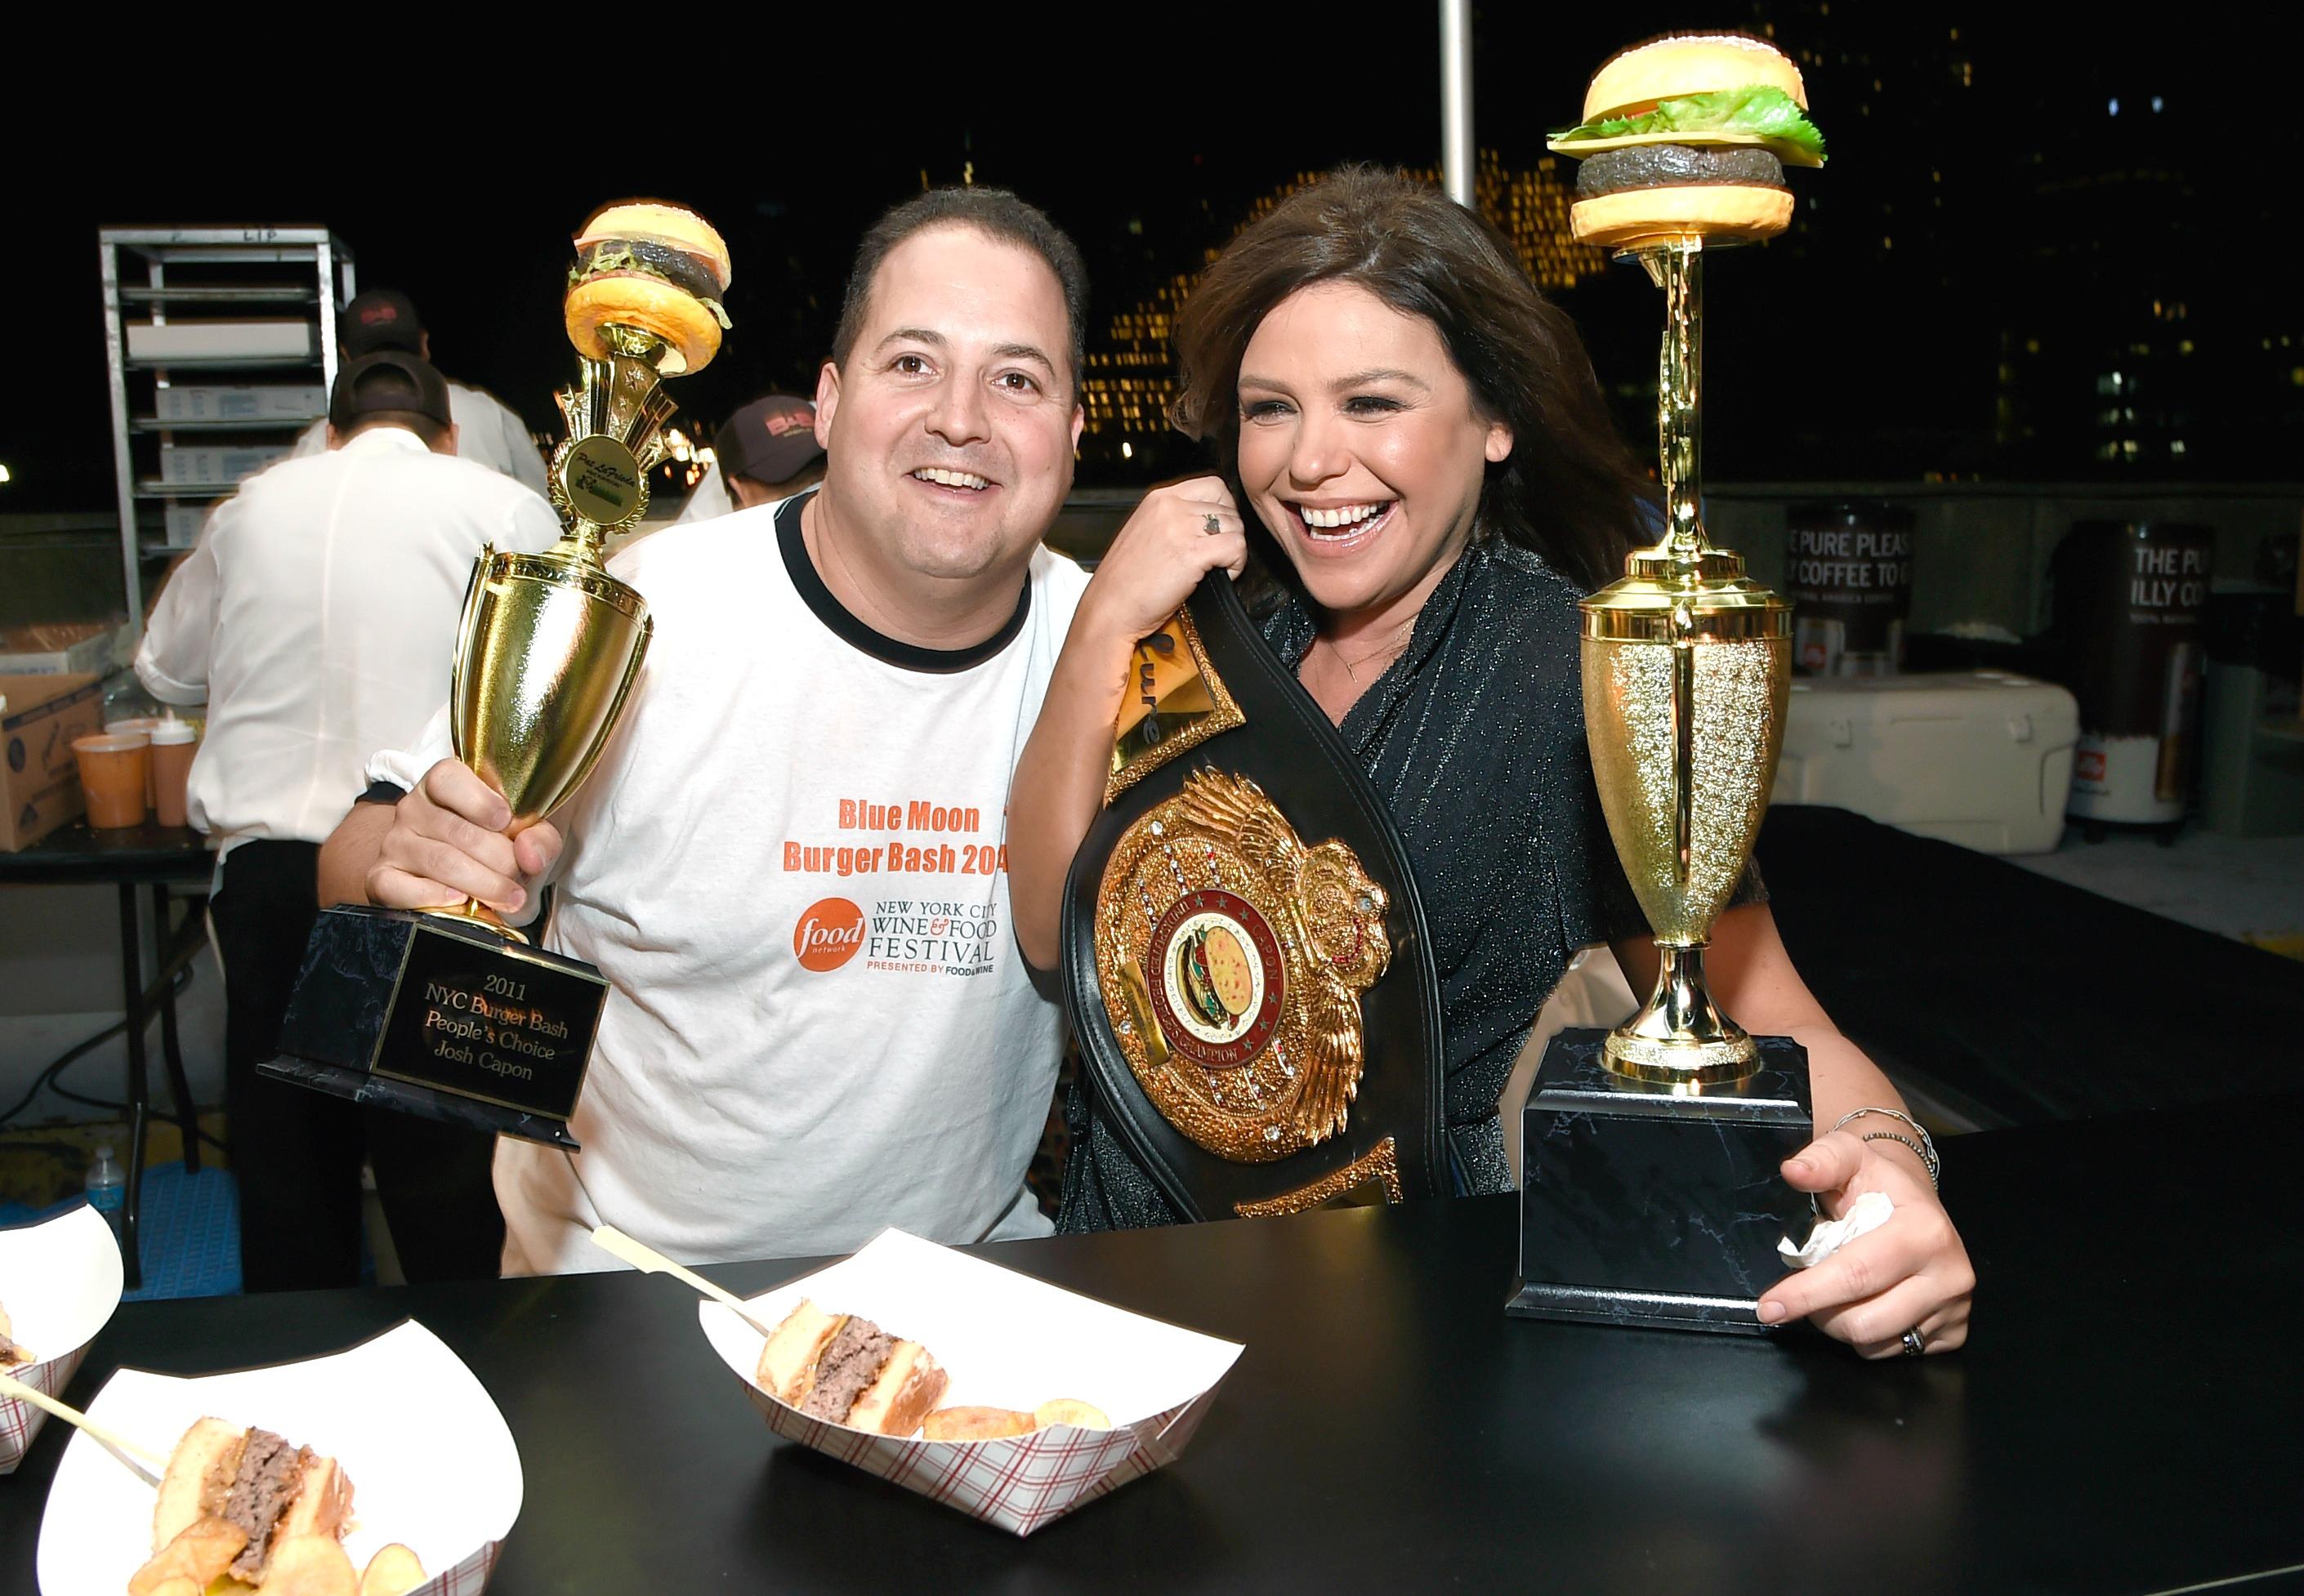 NYC Food & Wine Festival, Blue Moon Burger Bash, Rachael Ray